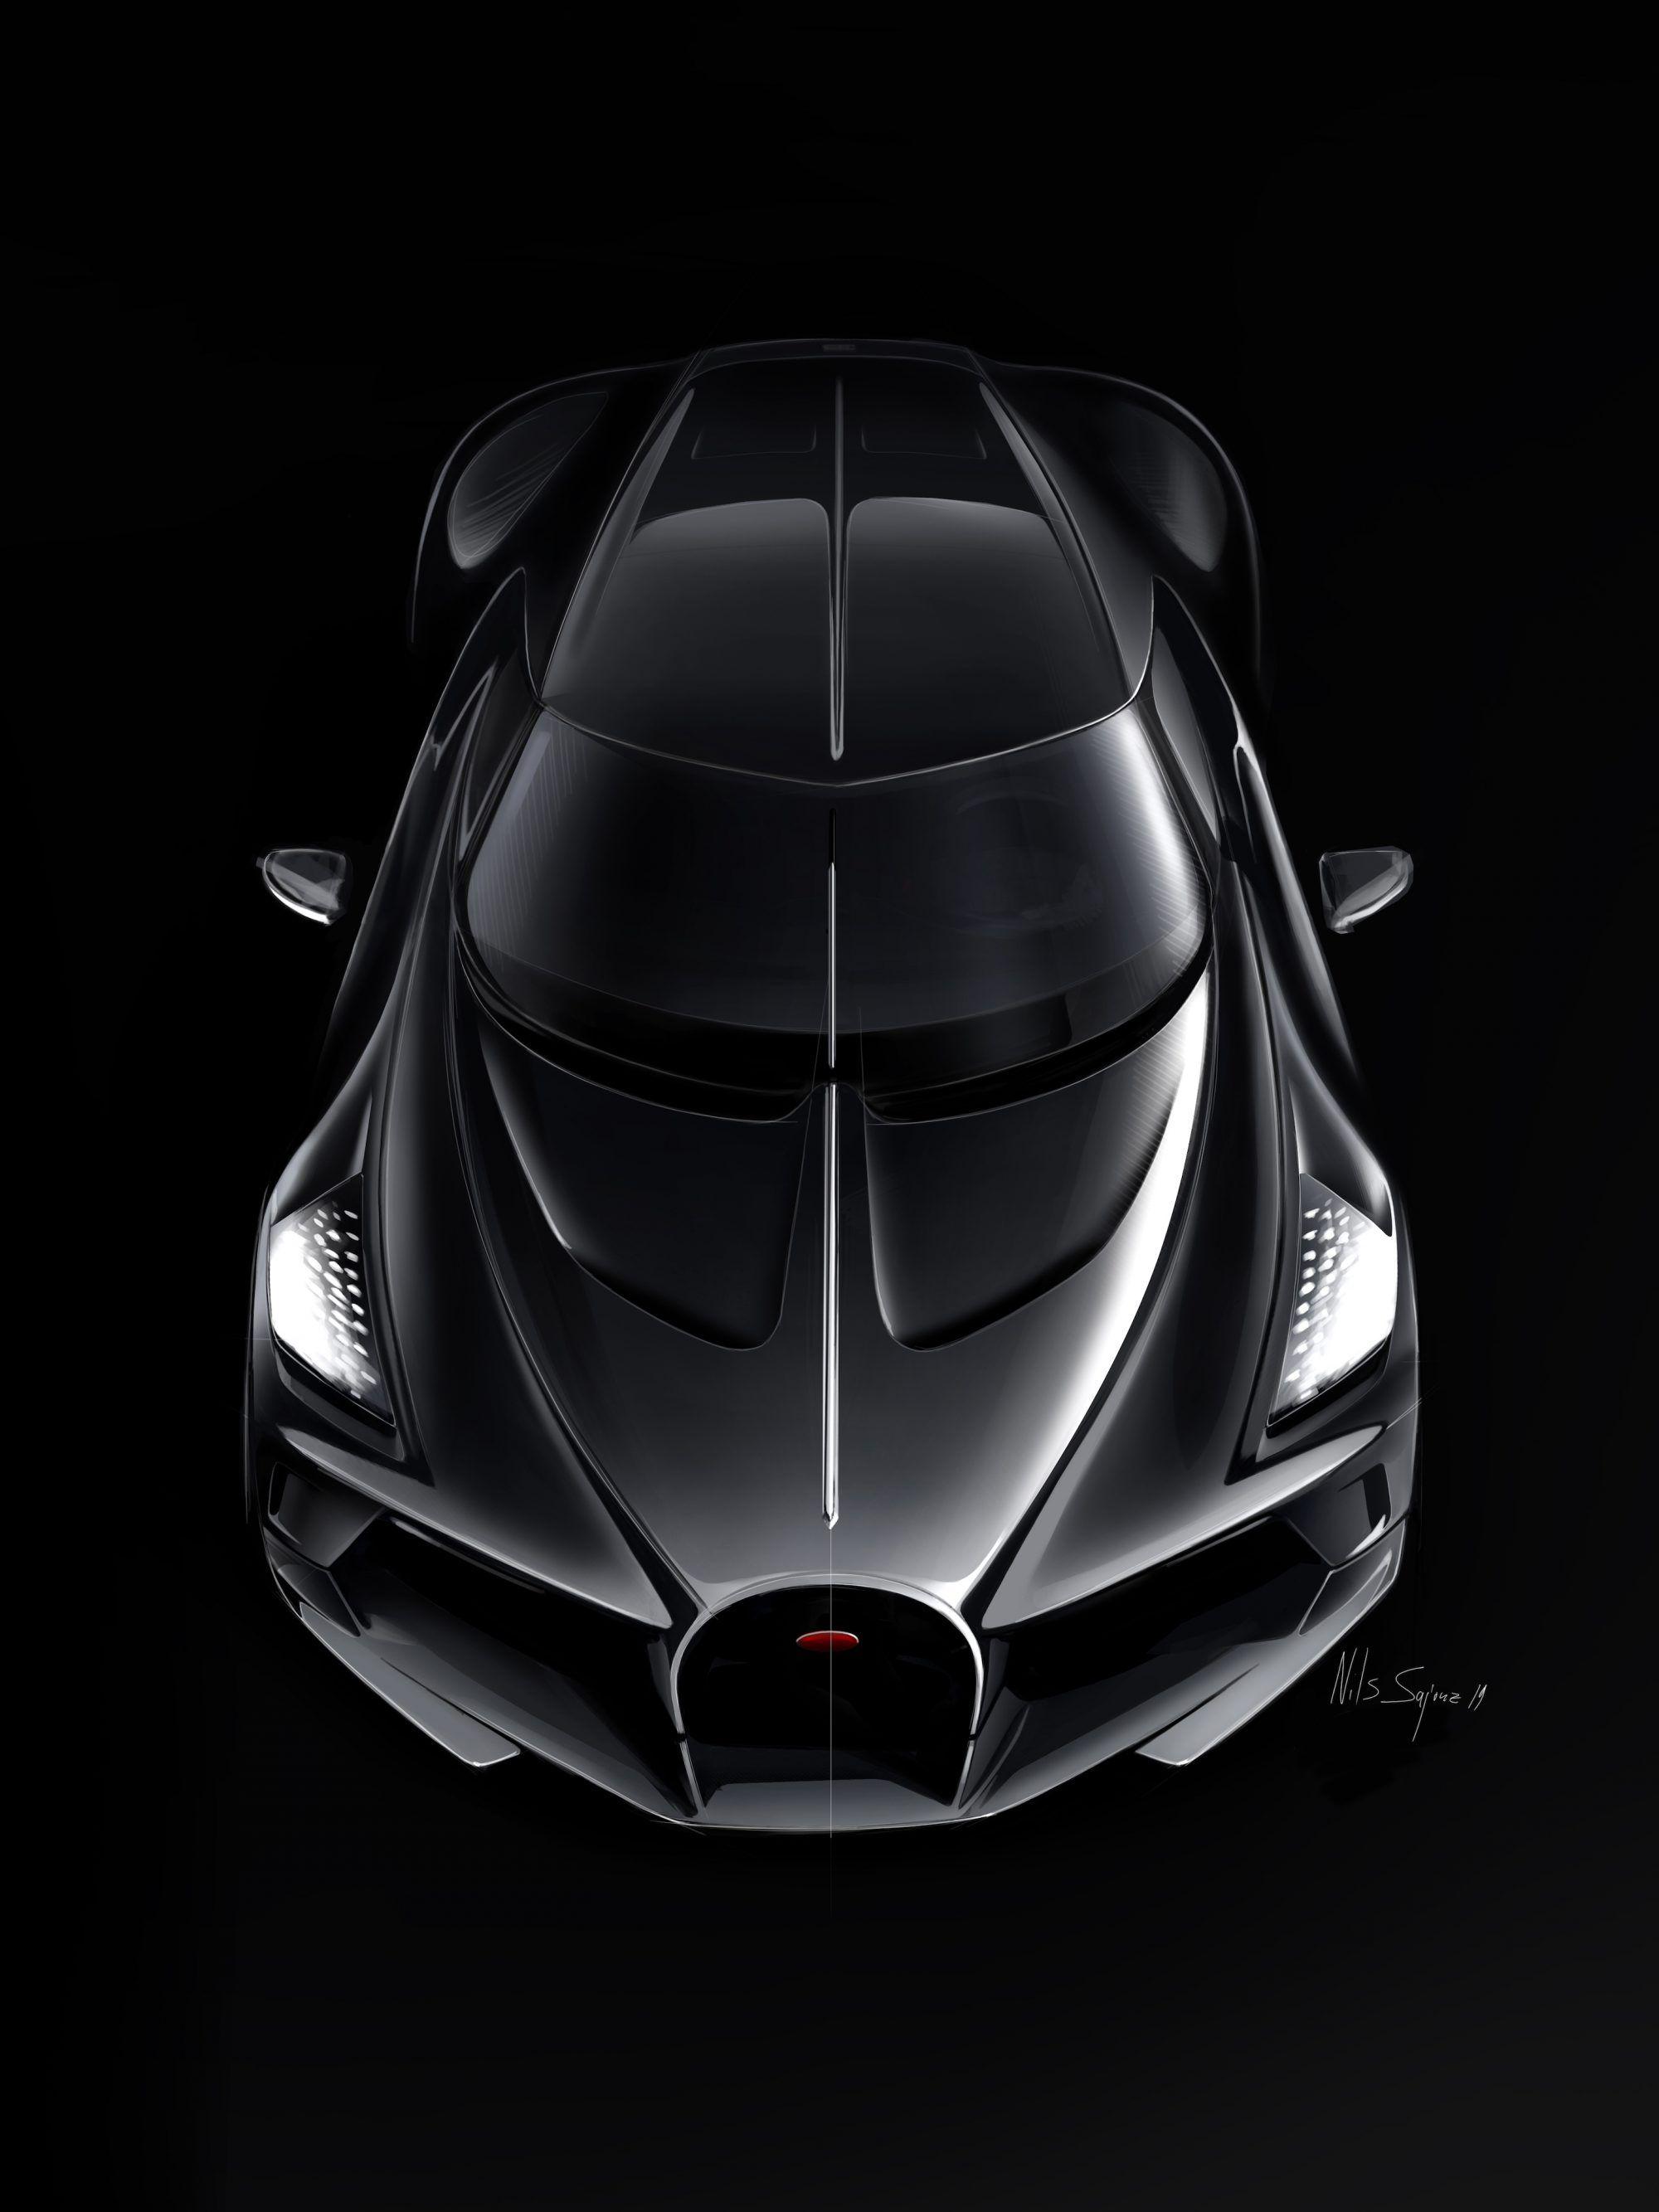 Bugatti S La Voiture Noire The Most Expensive New Car In The World La Voiture Noire Bugatti Sports Cars Luxury